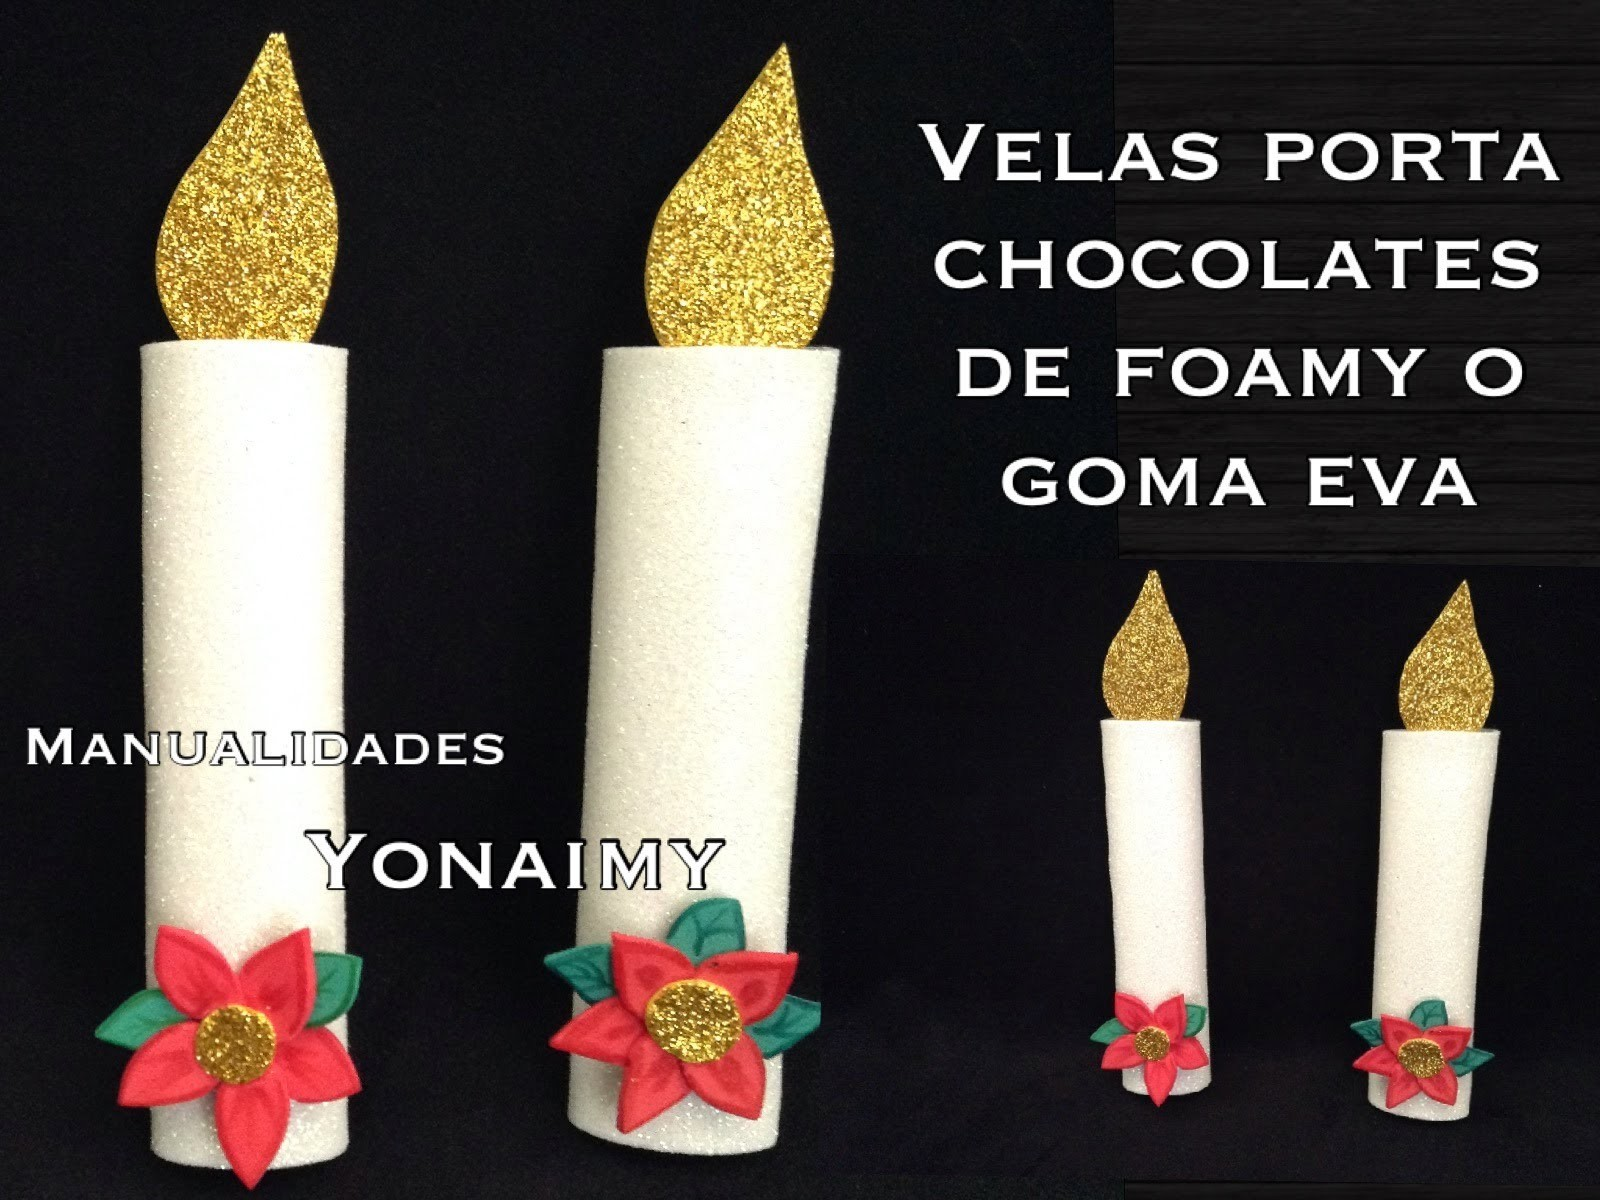 Velas navide as de foamy o goma eva porta chocolates for Velas navidenas